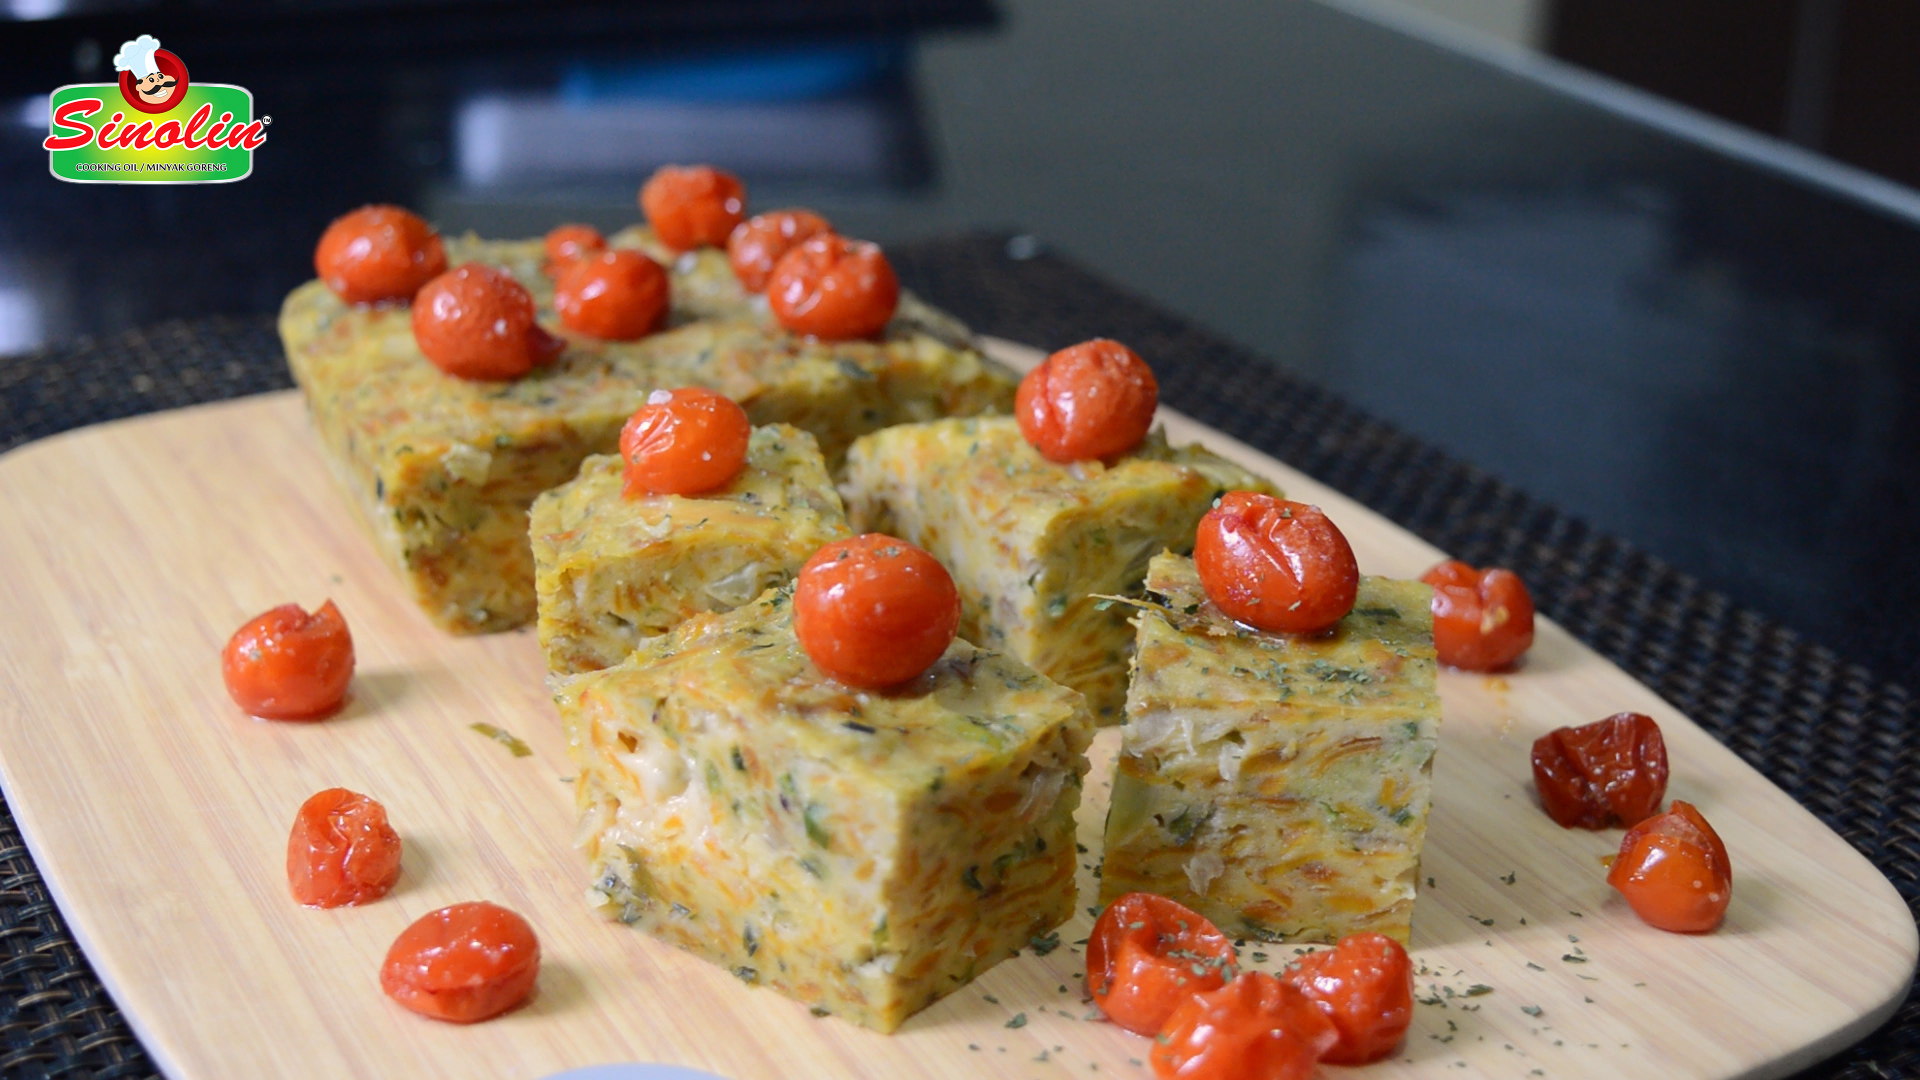 Irisan Brokoli dan Ubi jalar oleh Dapur Sinolin